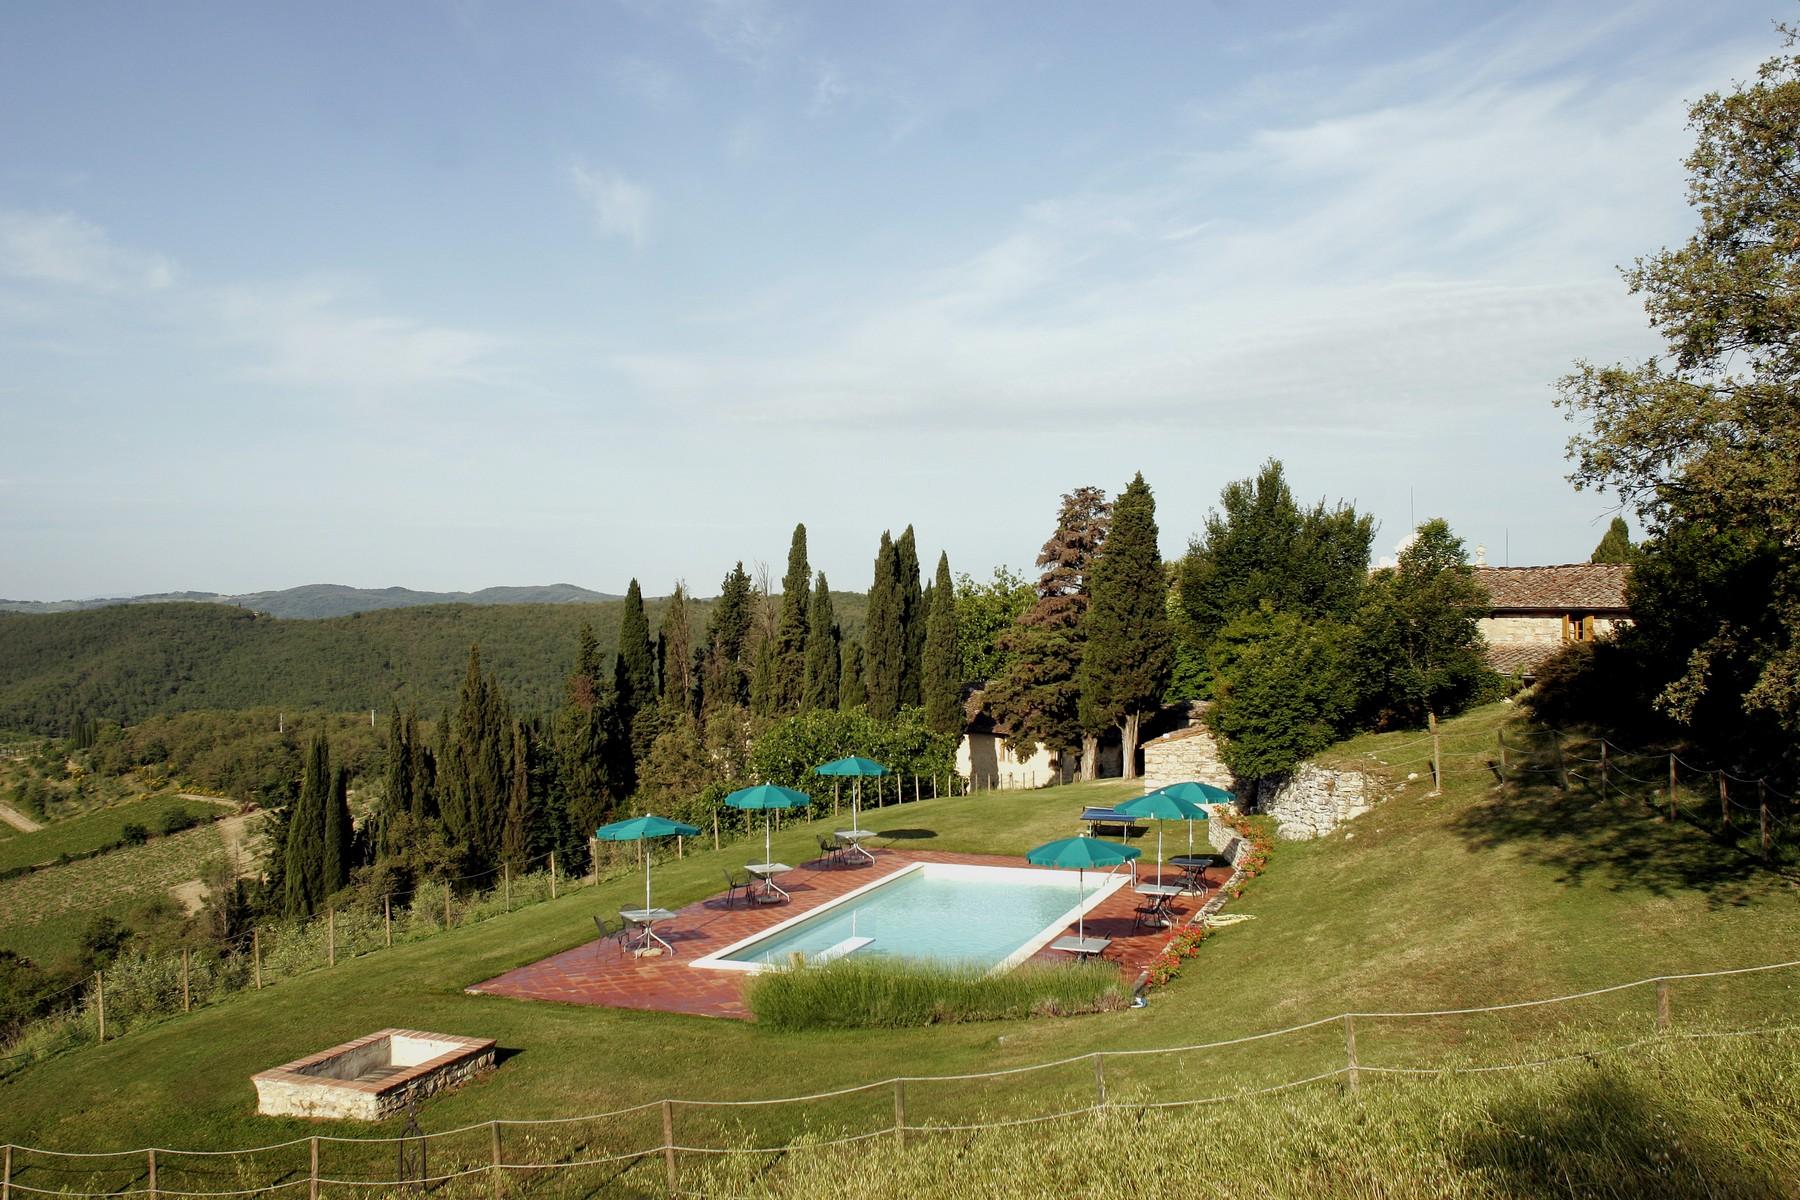 Villa in Vendita a Gaiole In Chianti: 5 locali, 4285 mq - Foto 12